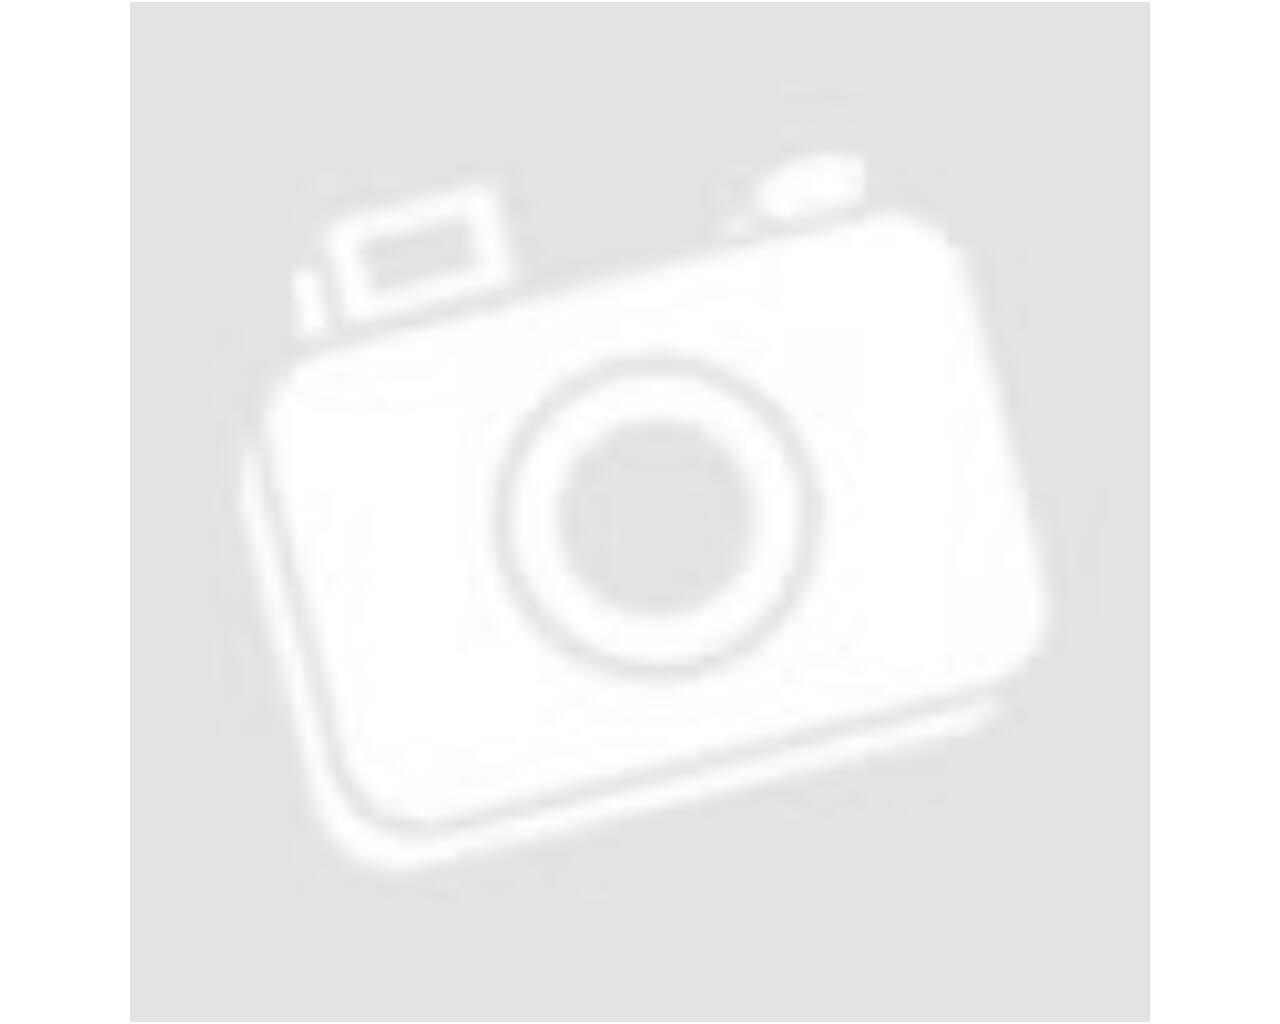 Mosdókagyló Savini Due Sole 80 2451, fehér, 80 cm